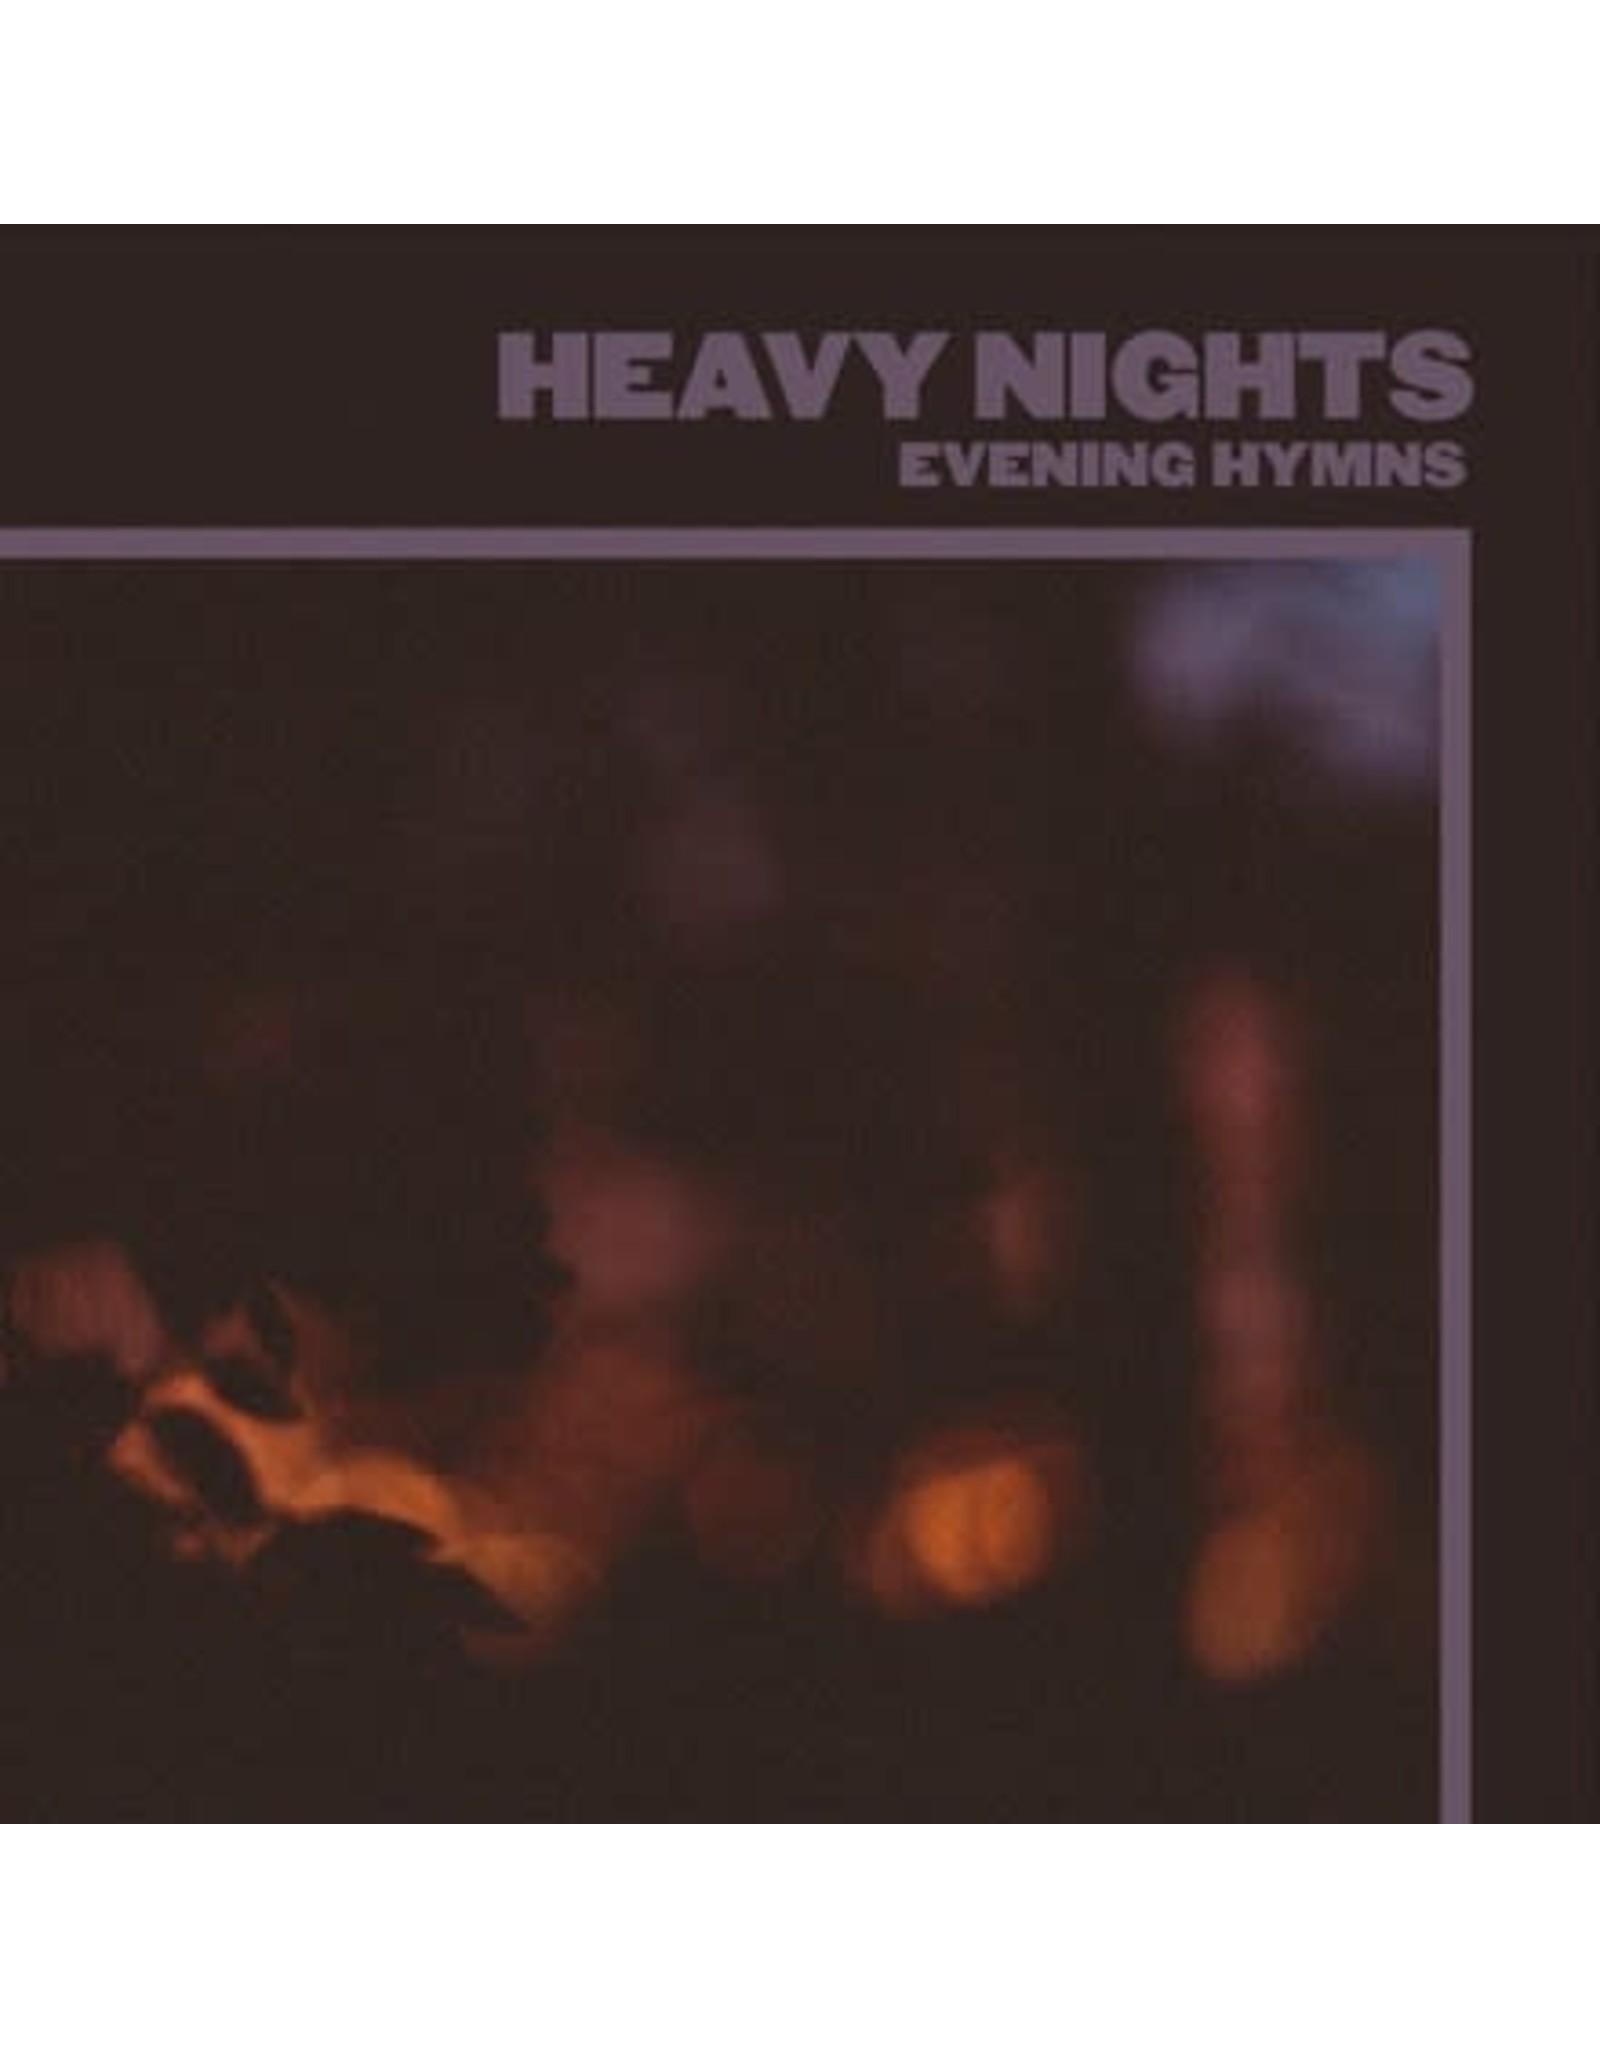 Shuffling Feet Evening Hymns: Heavy Nights LP